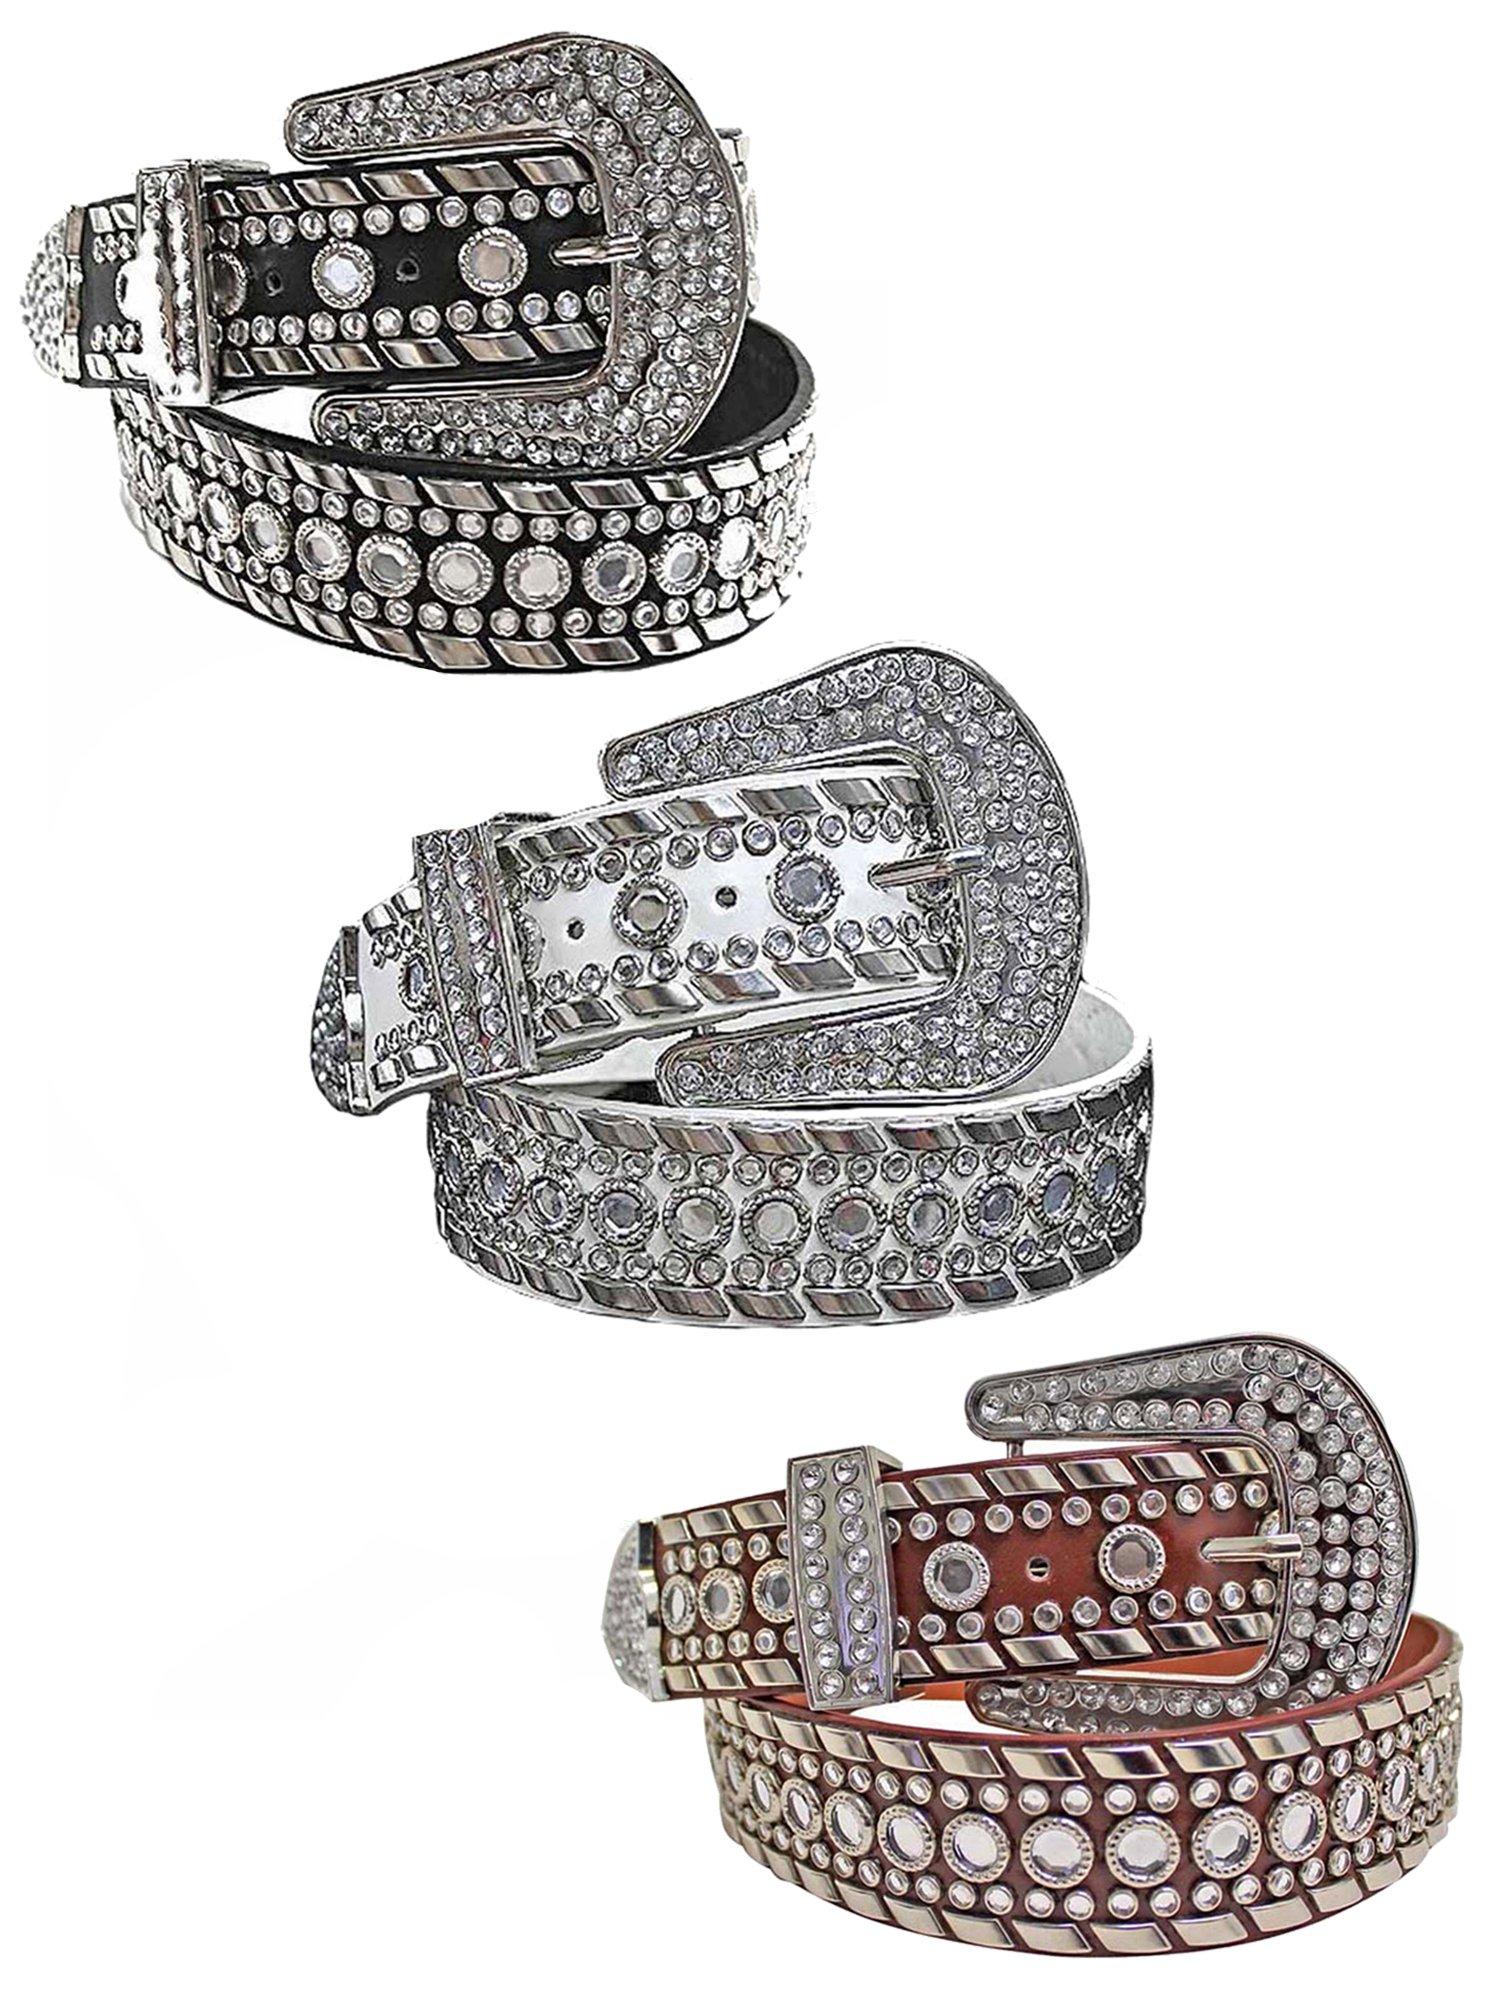 Black White Brown 3 Pack Rhinestone Western Belt For Women Size Medium by Luxury Divas (Image #1)